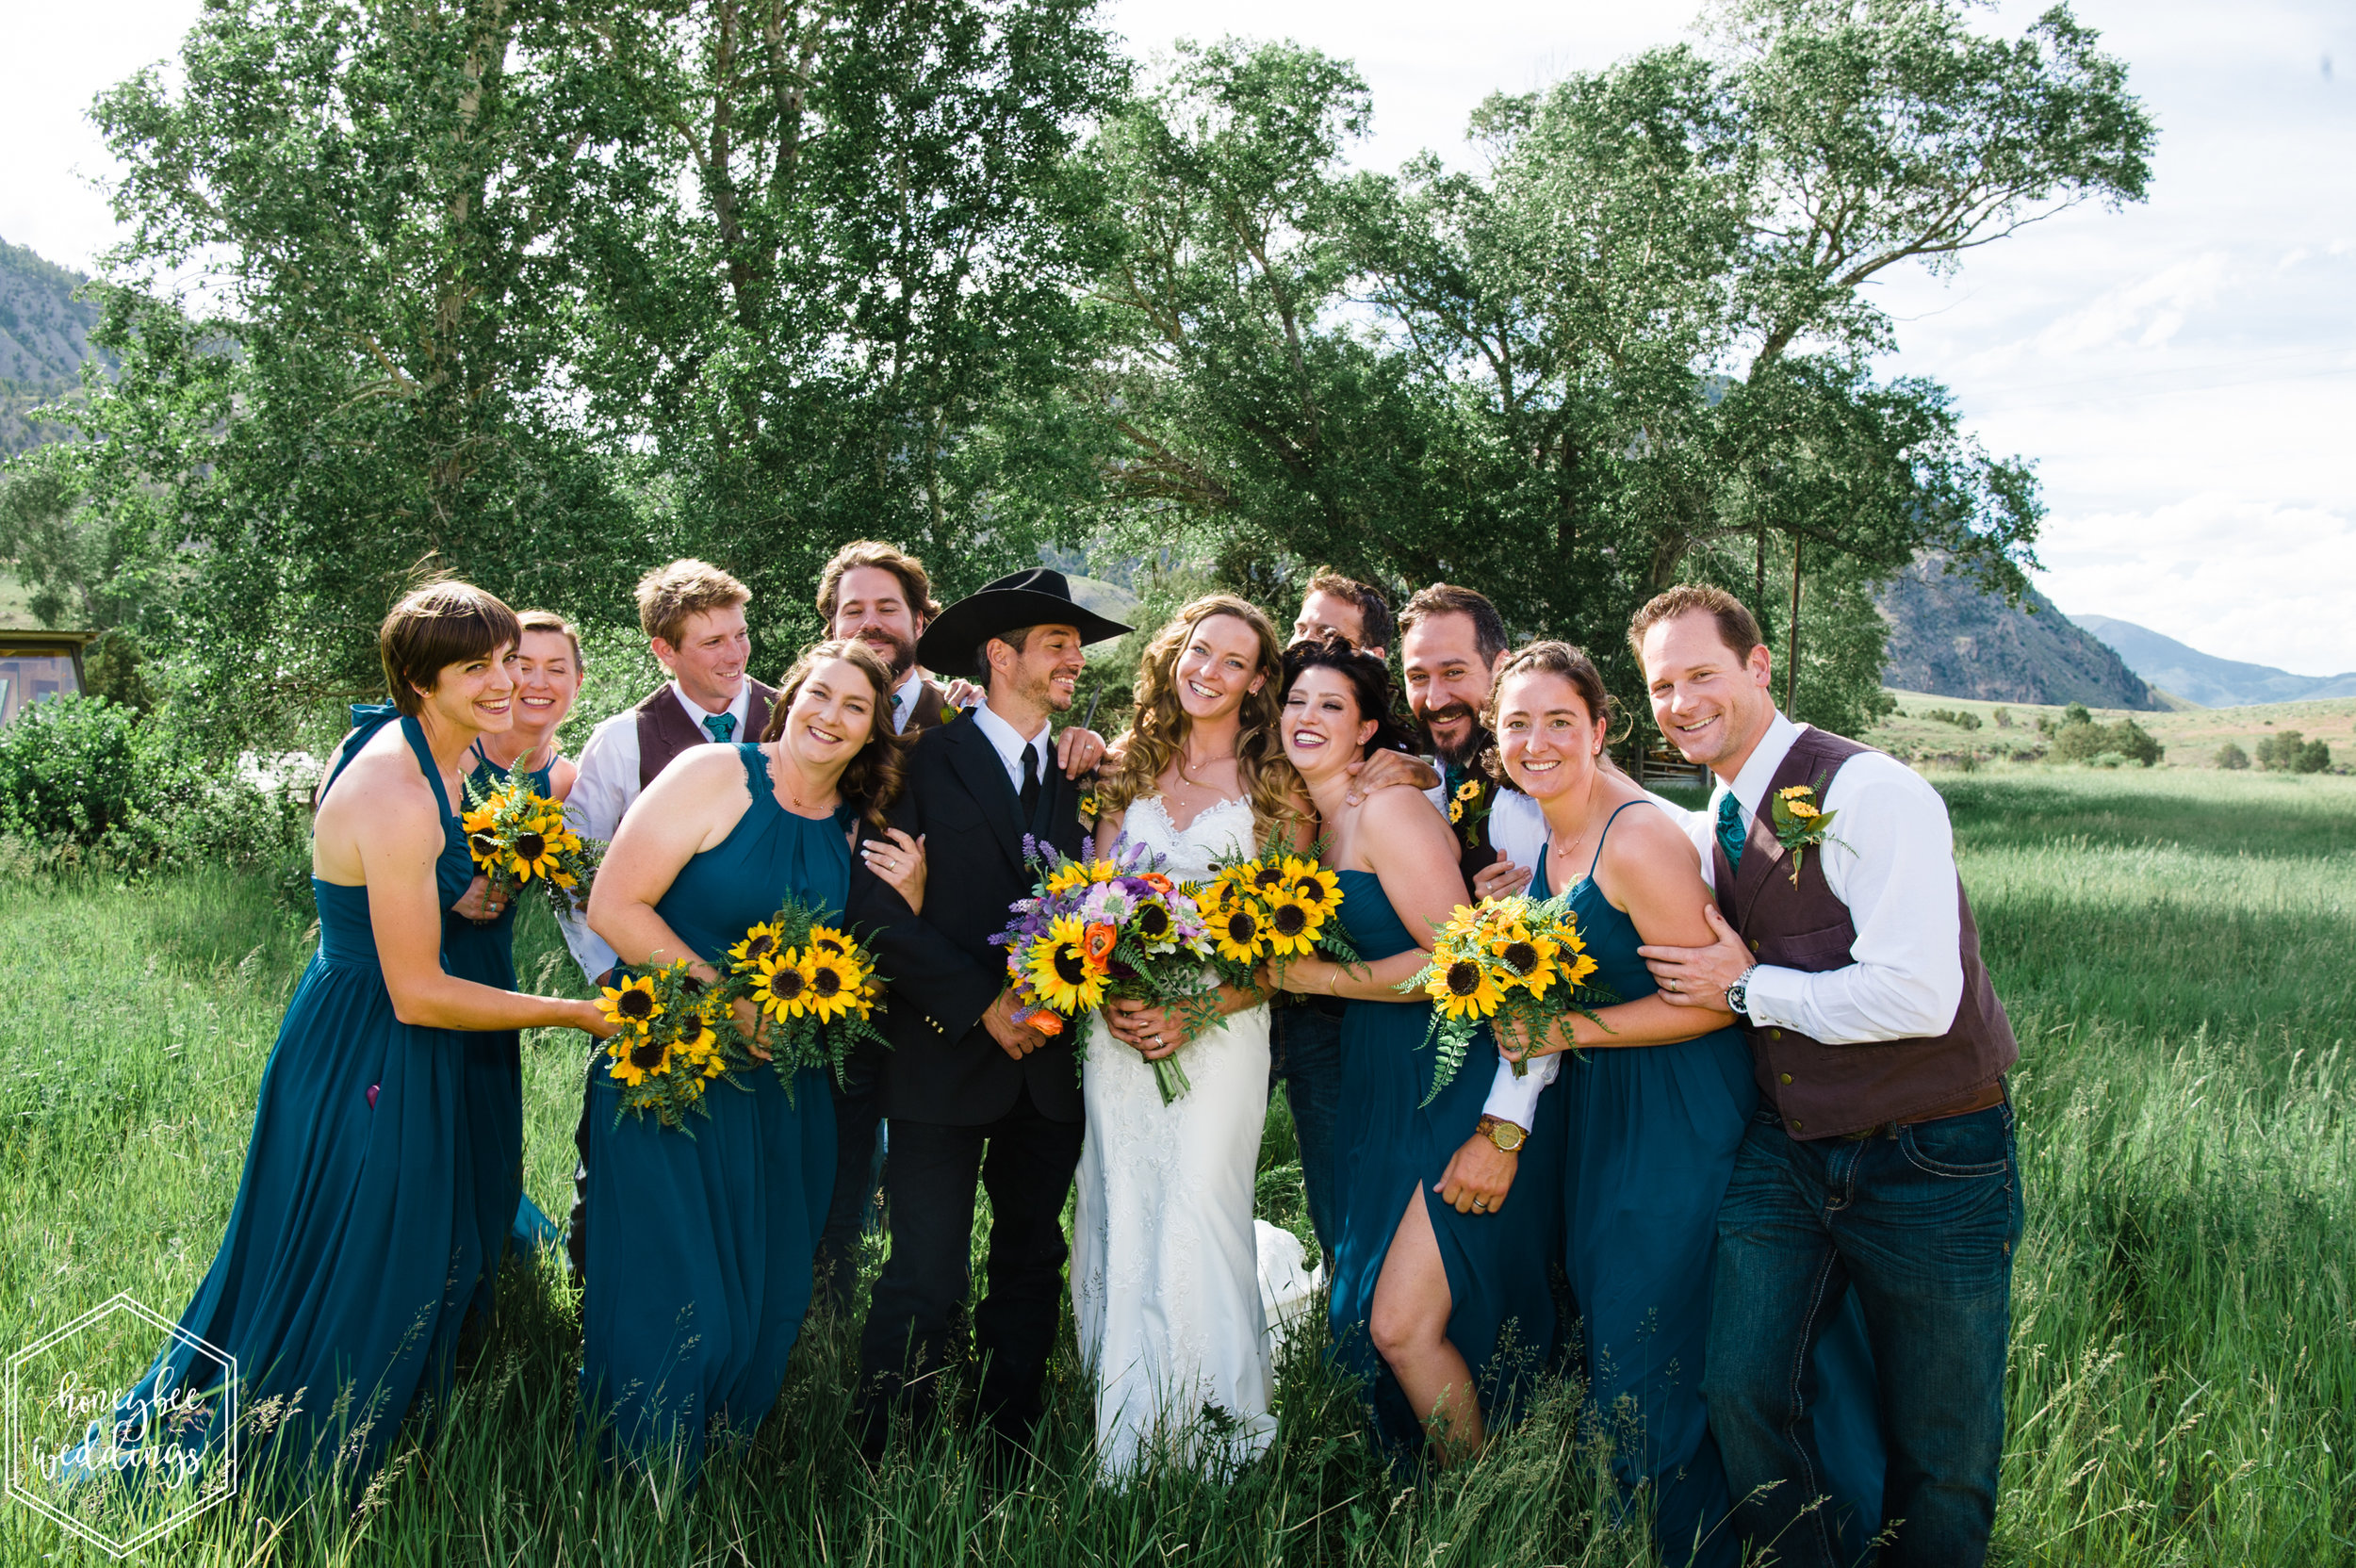 085Yellowstone National Park Wedding_Montana Wedding Photographer_Honeybee Weddings_Shannon & Jonathan_June 29, 2019-504.jpg